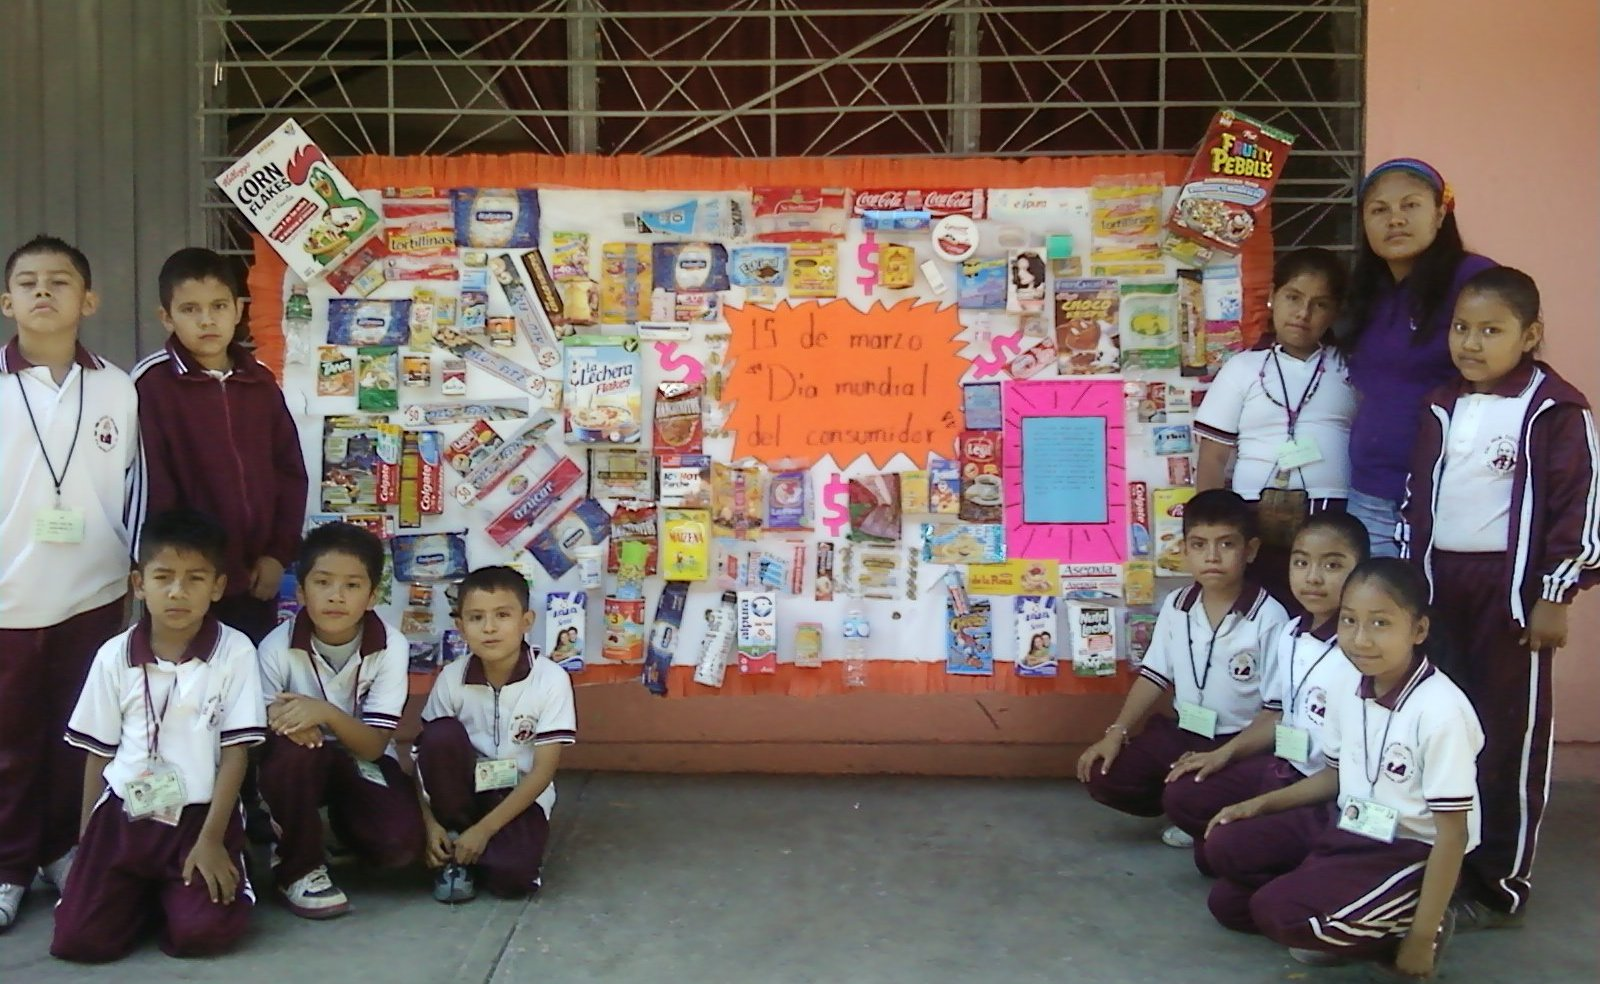 Programa nacional de lectura regi n monta a alta de for Cuanto cobrar por pintar un mural